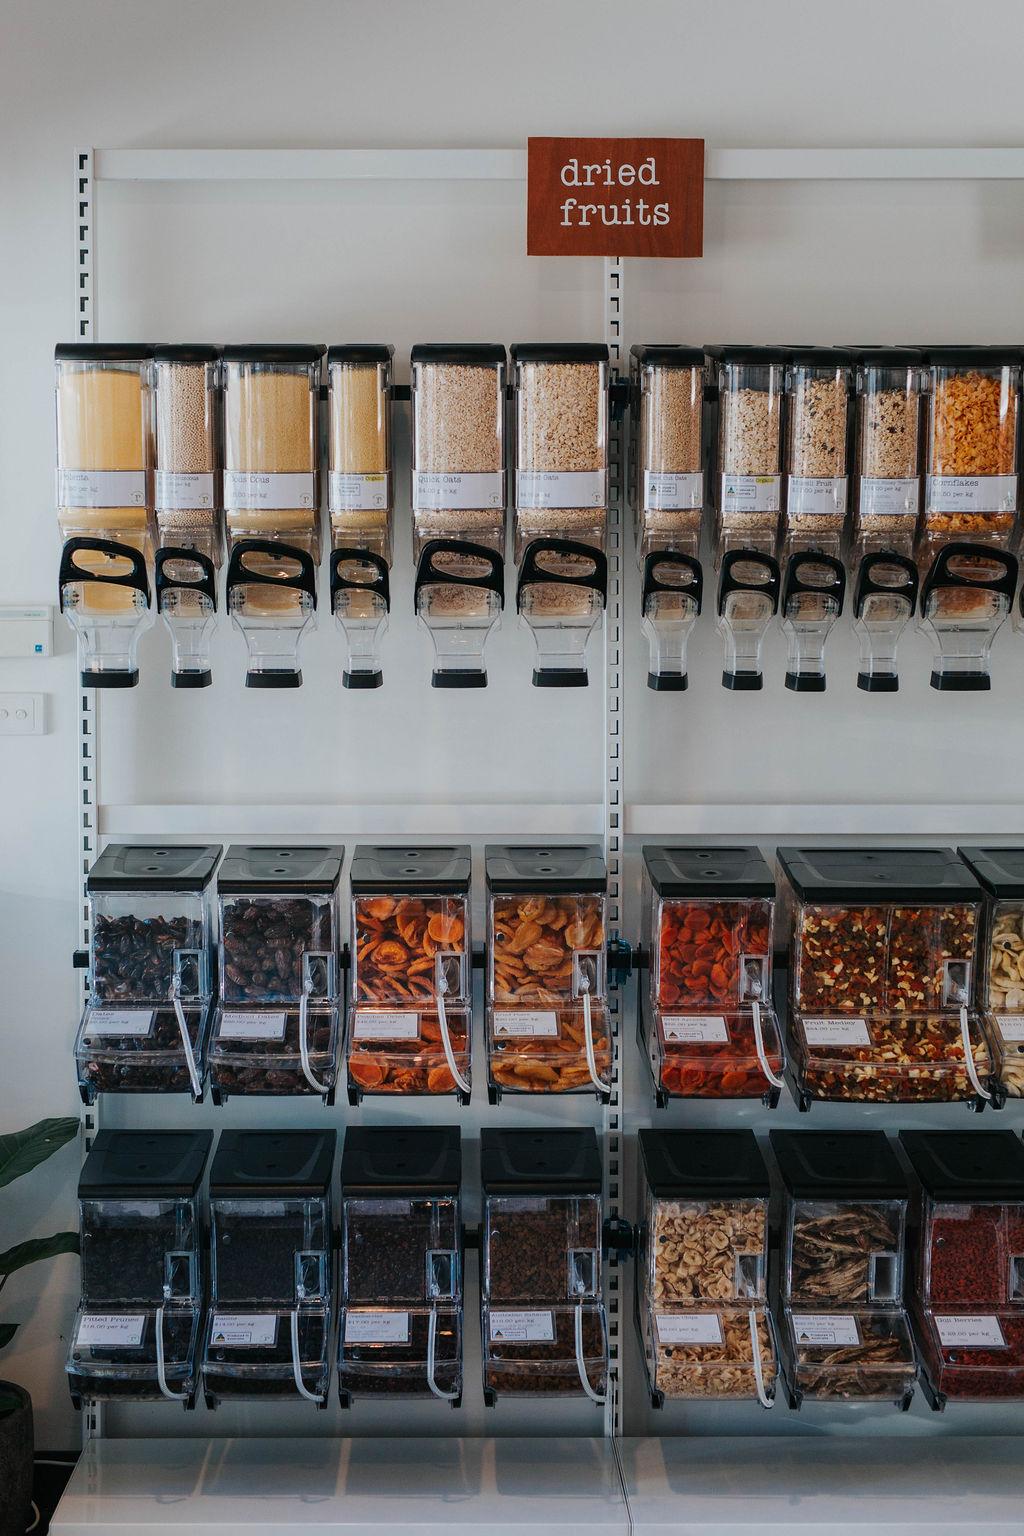 Replenish_Unpackaged_Living_Perth_Kalamunda_Waste_Free_Shopping_Bulk_Groceries_Sustainable_Zero_Wast_Wasteless_Goods_Whole_Foods_Plastic_Free_HOME_Gallery_4.jpg